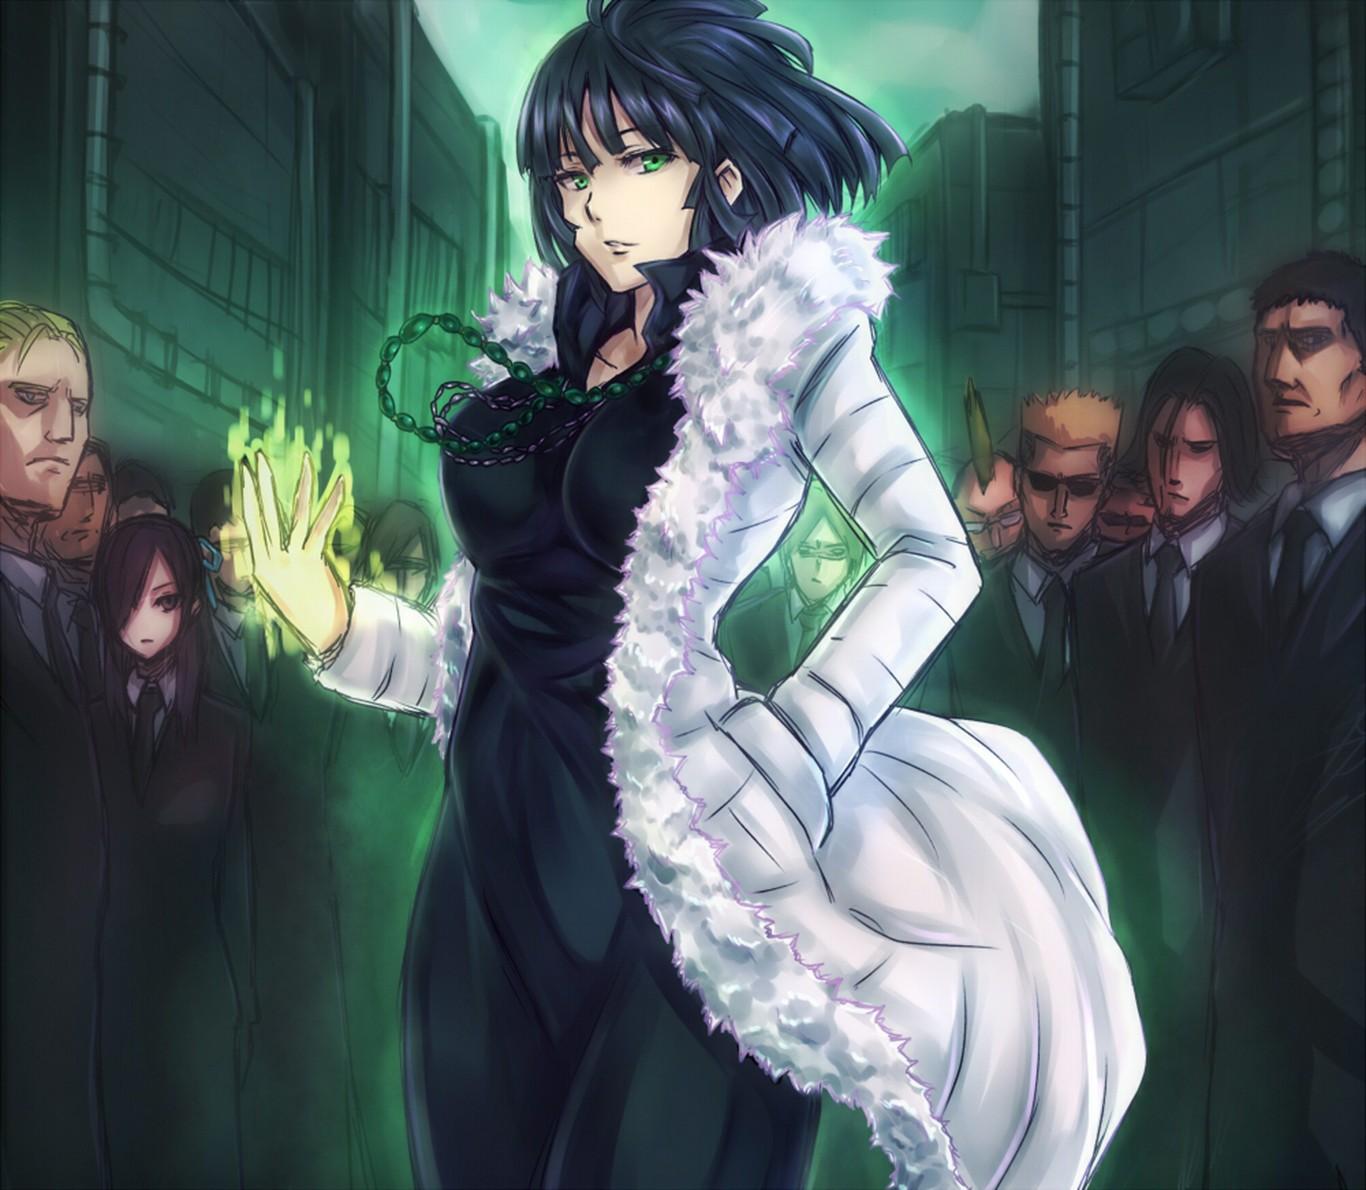 Wallpaper Anime Girls Fubuki One Punch Man Screenshot